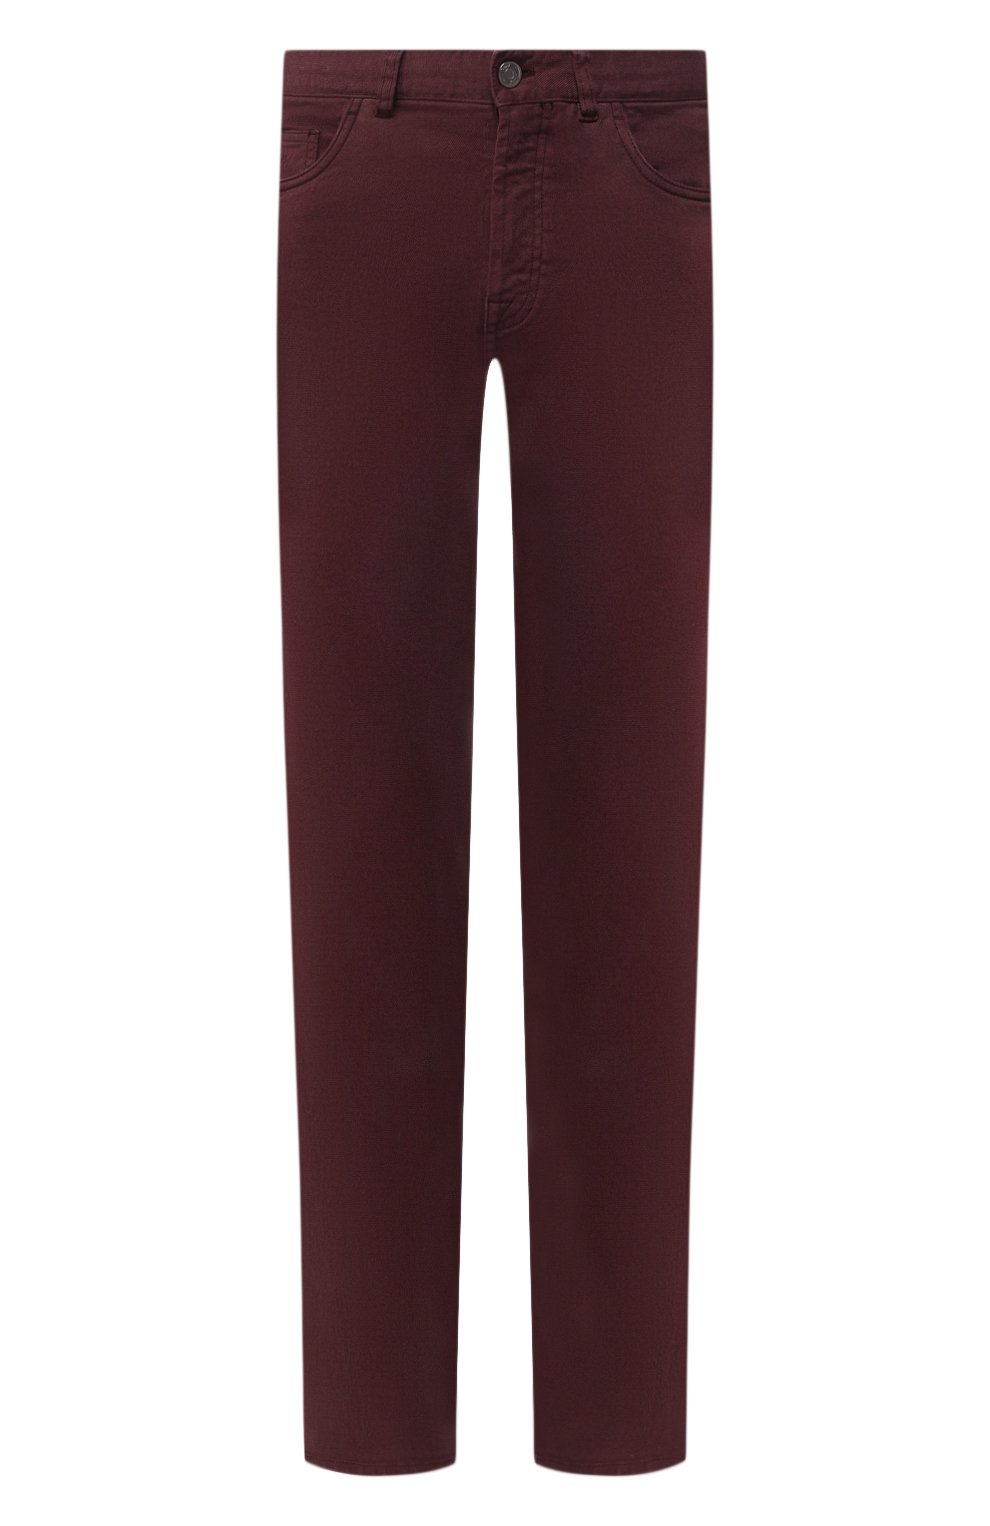 Мужские джинсы BRIONI бордового цвета, арт. SPNJ0M/08T01/STELVI0   Фото 1